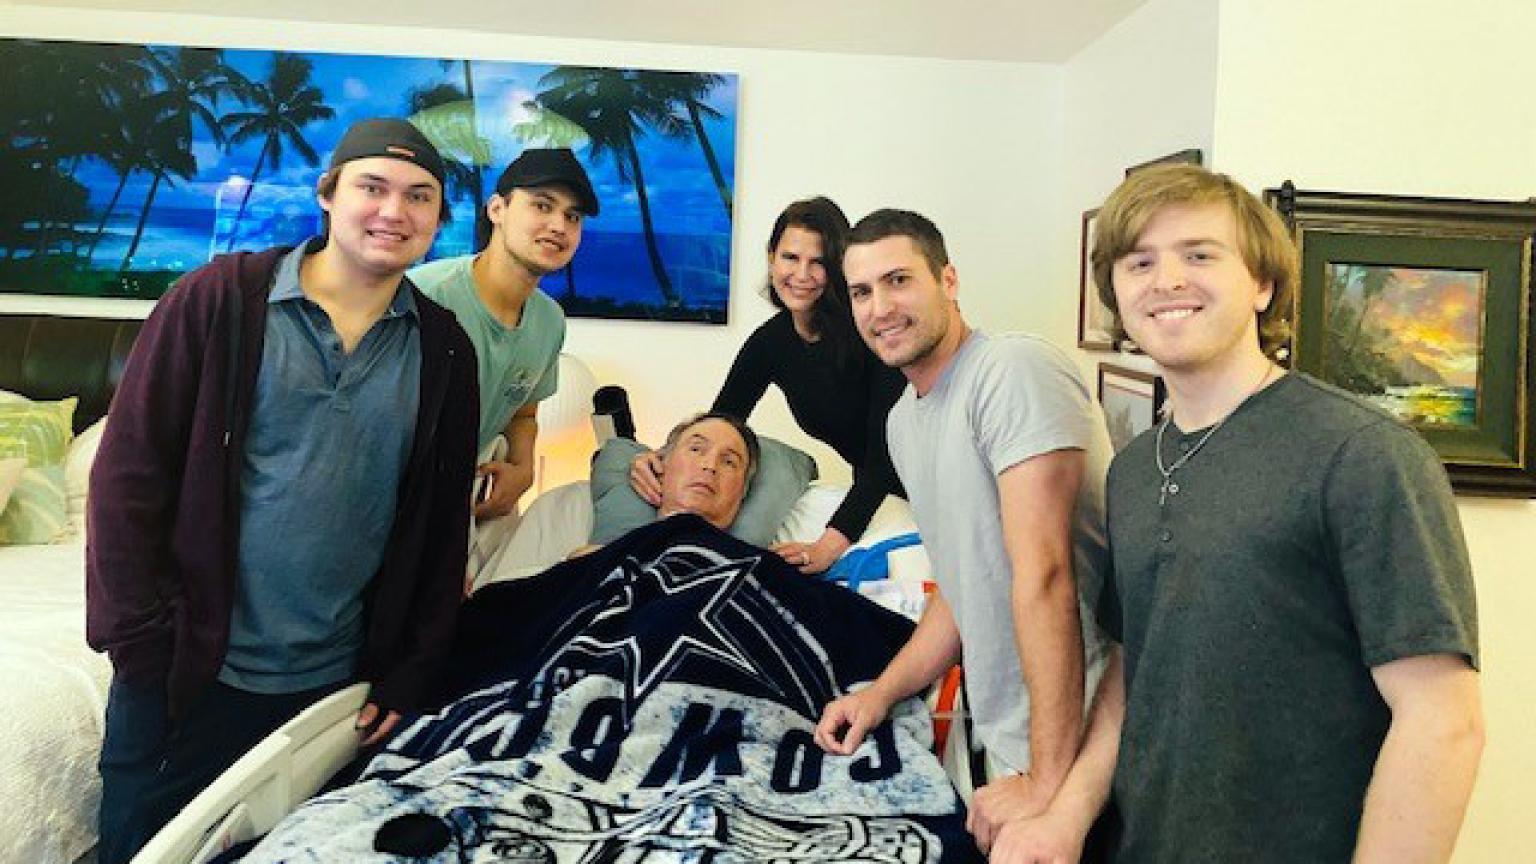 Derek Wood and family